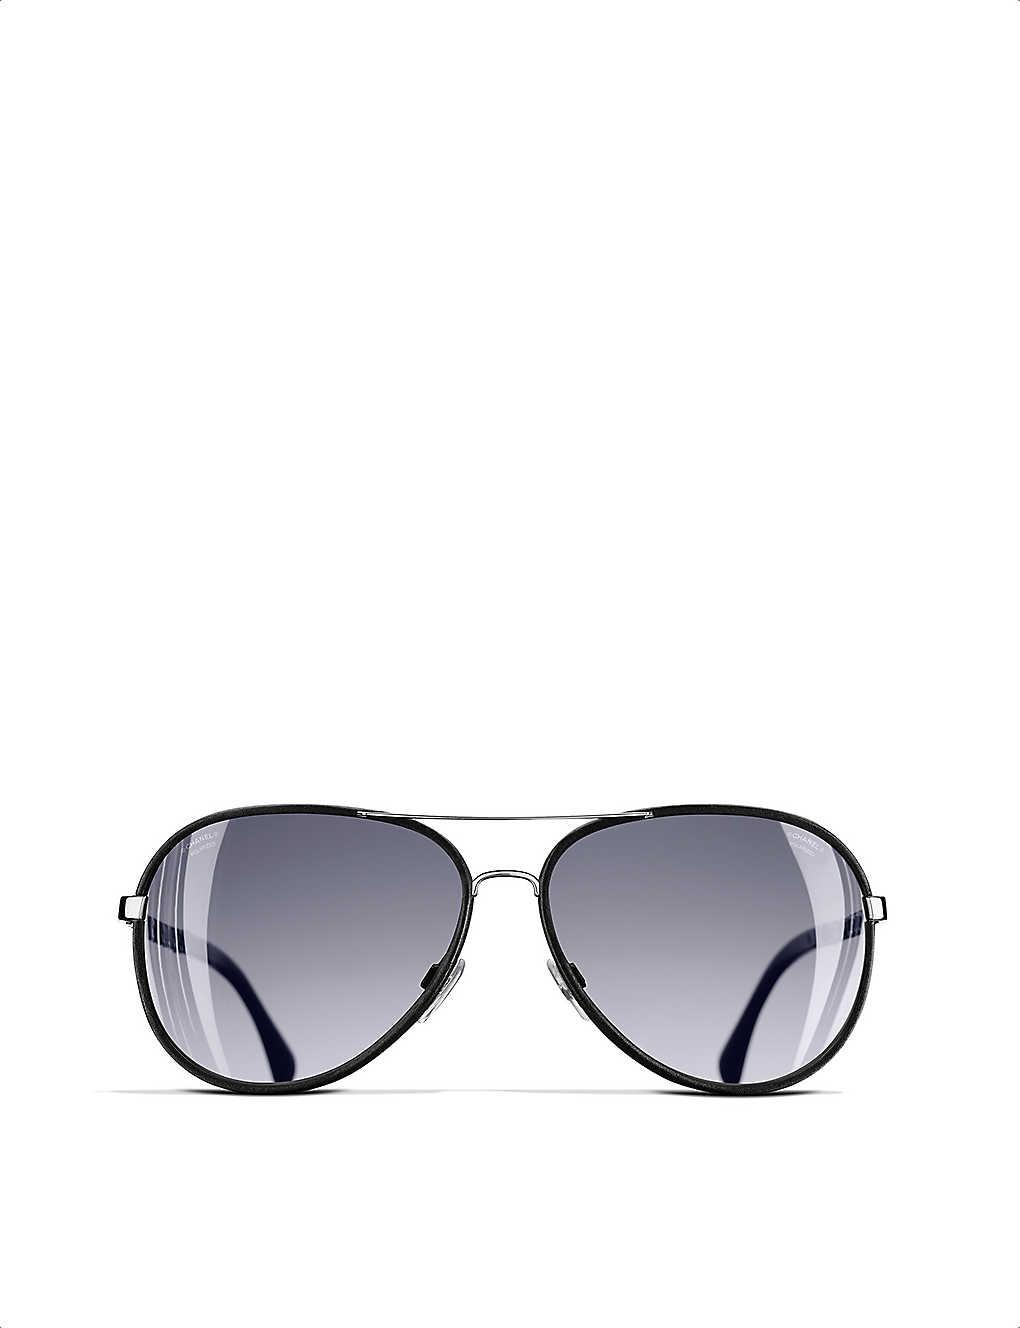 e670df7145c58 Pilot sunglasses zoom  Pilot sunglasses zoom ...